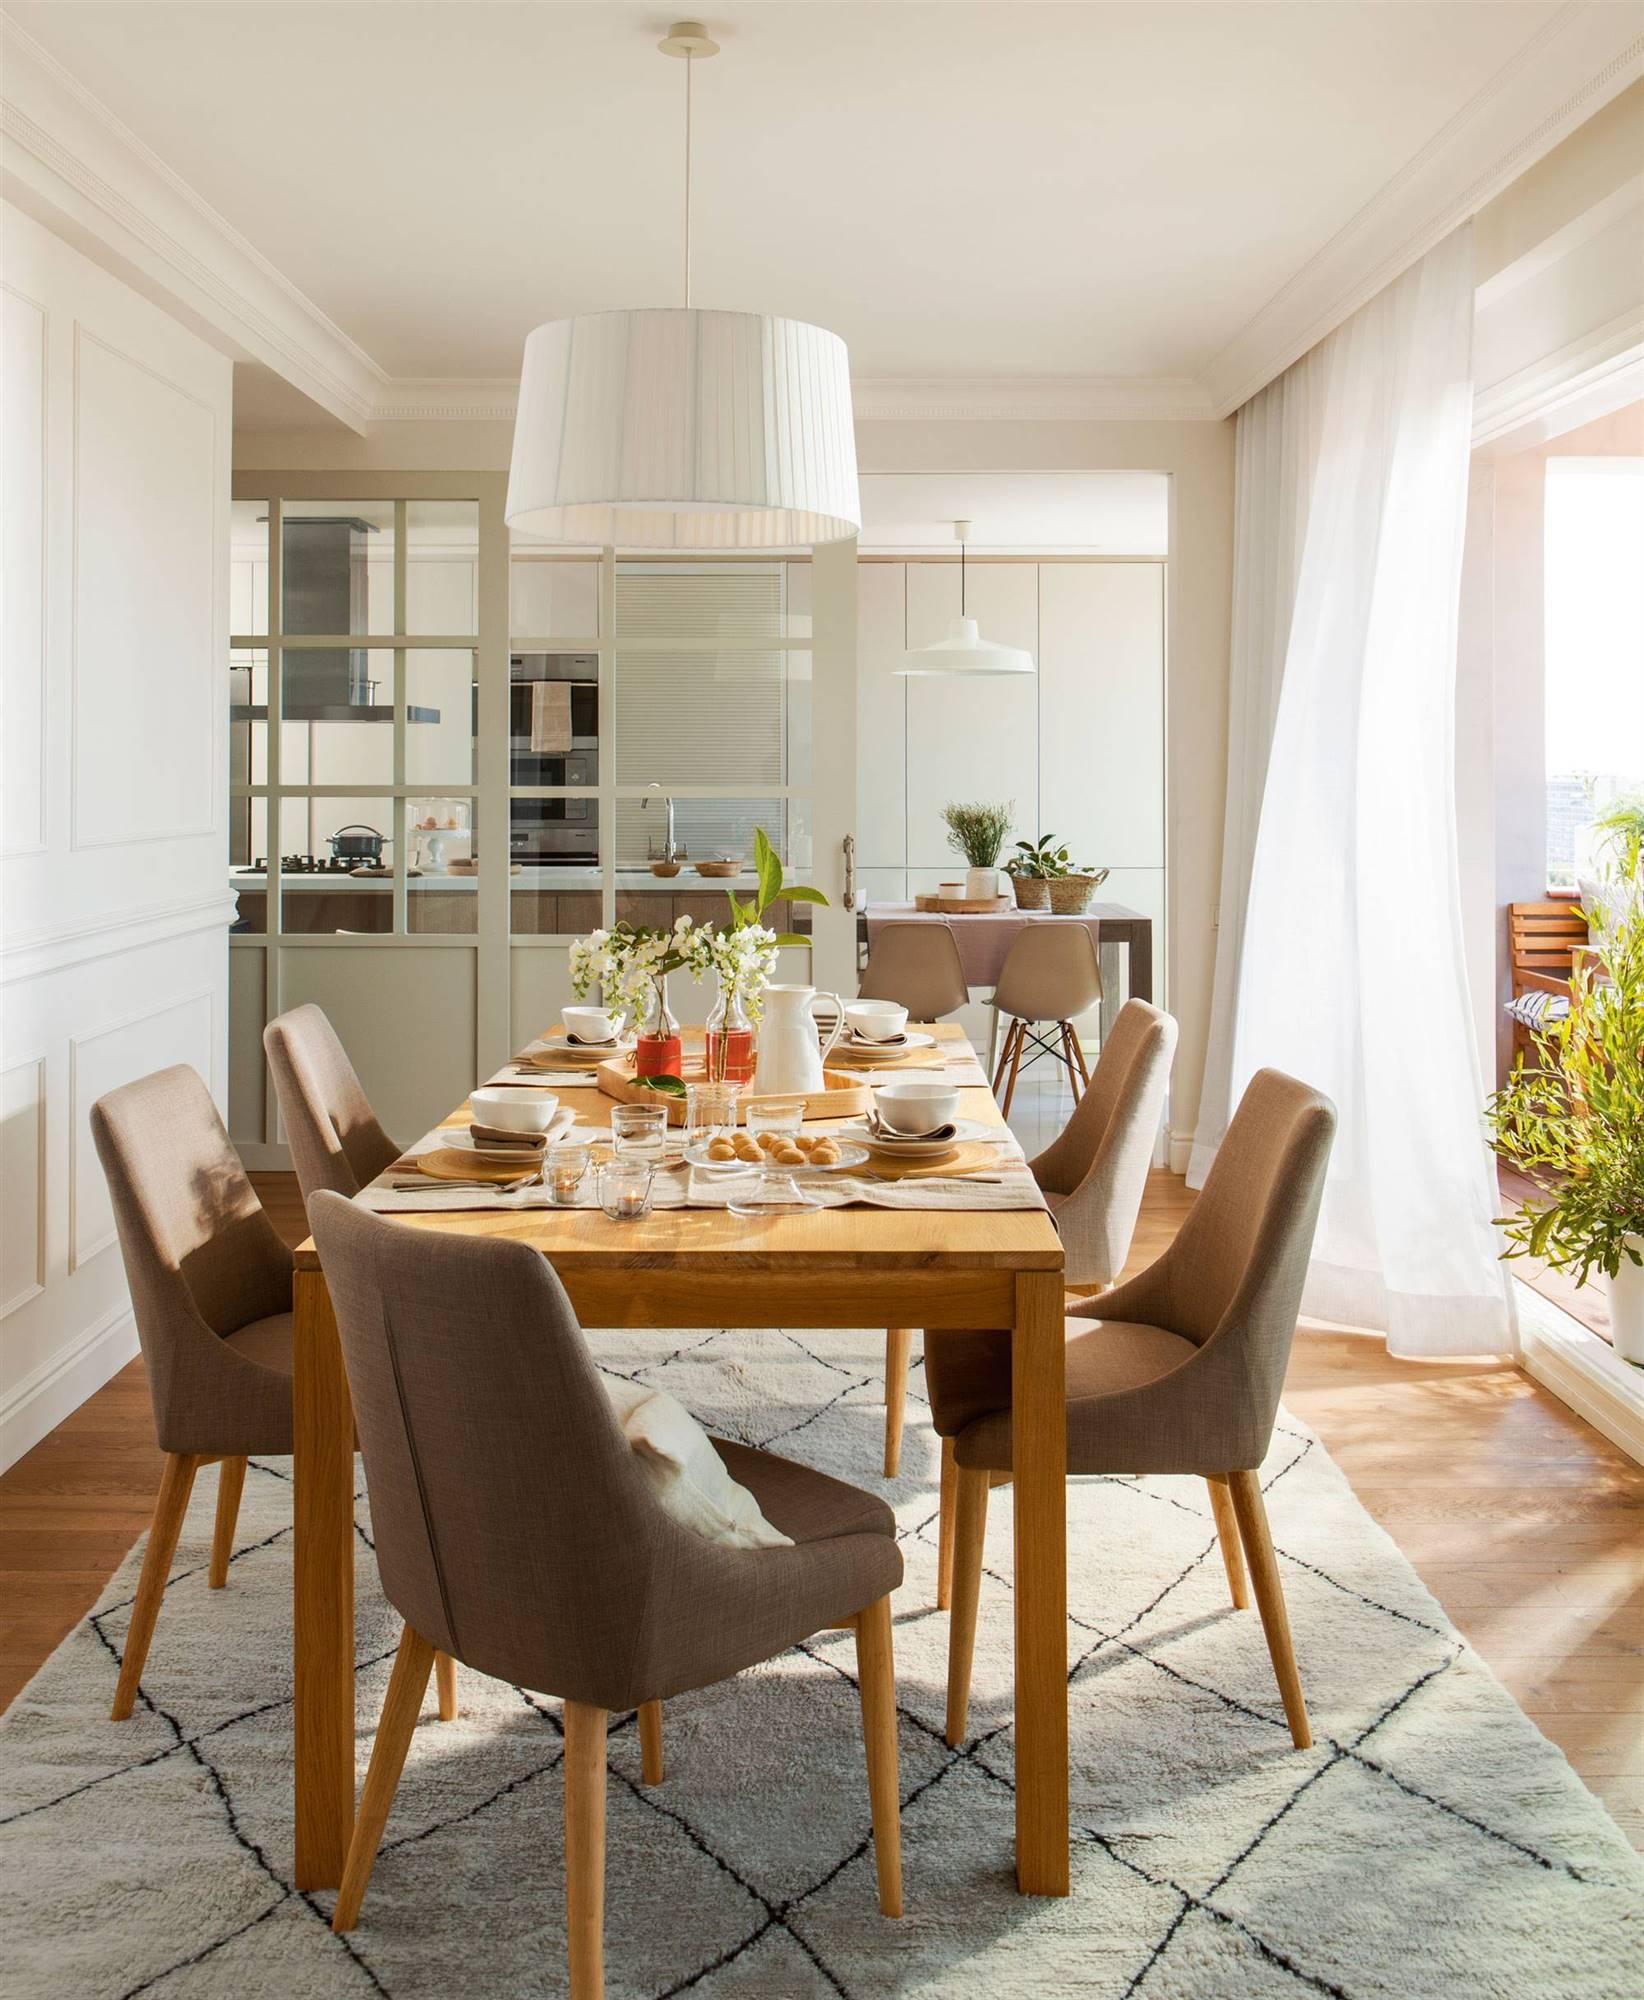 Comedores modernos for Mesas y sillas de comedor en carrefour